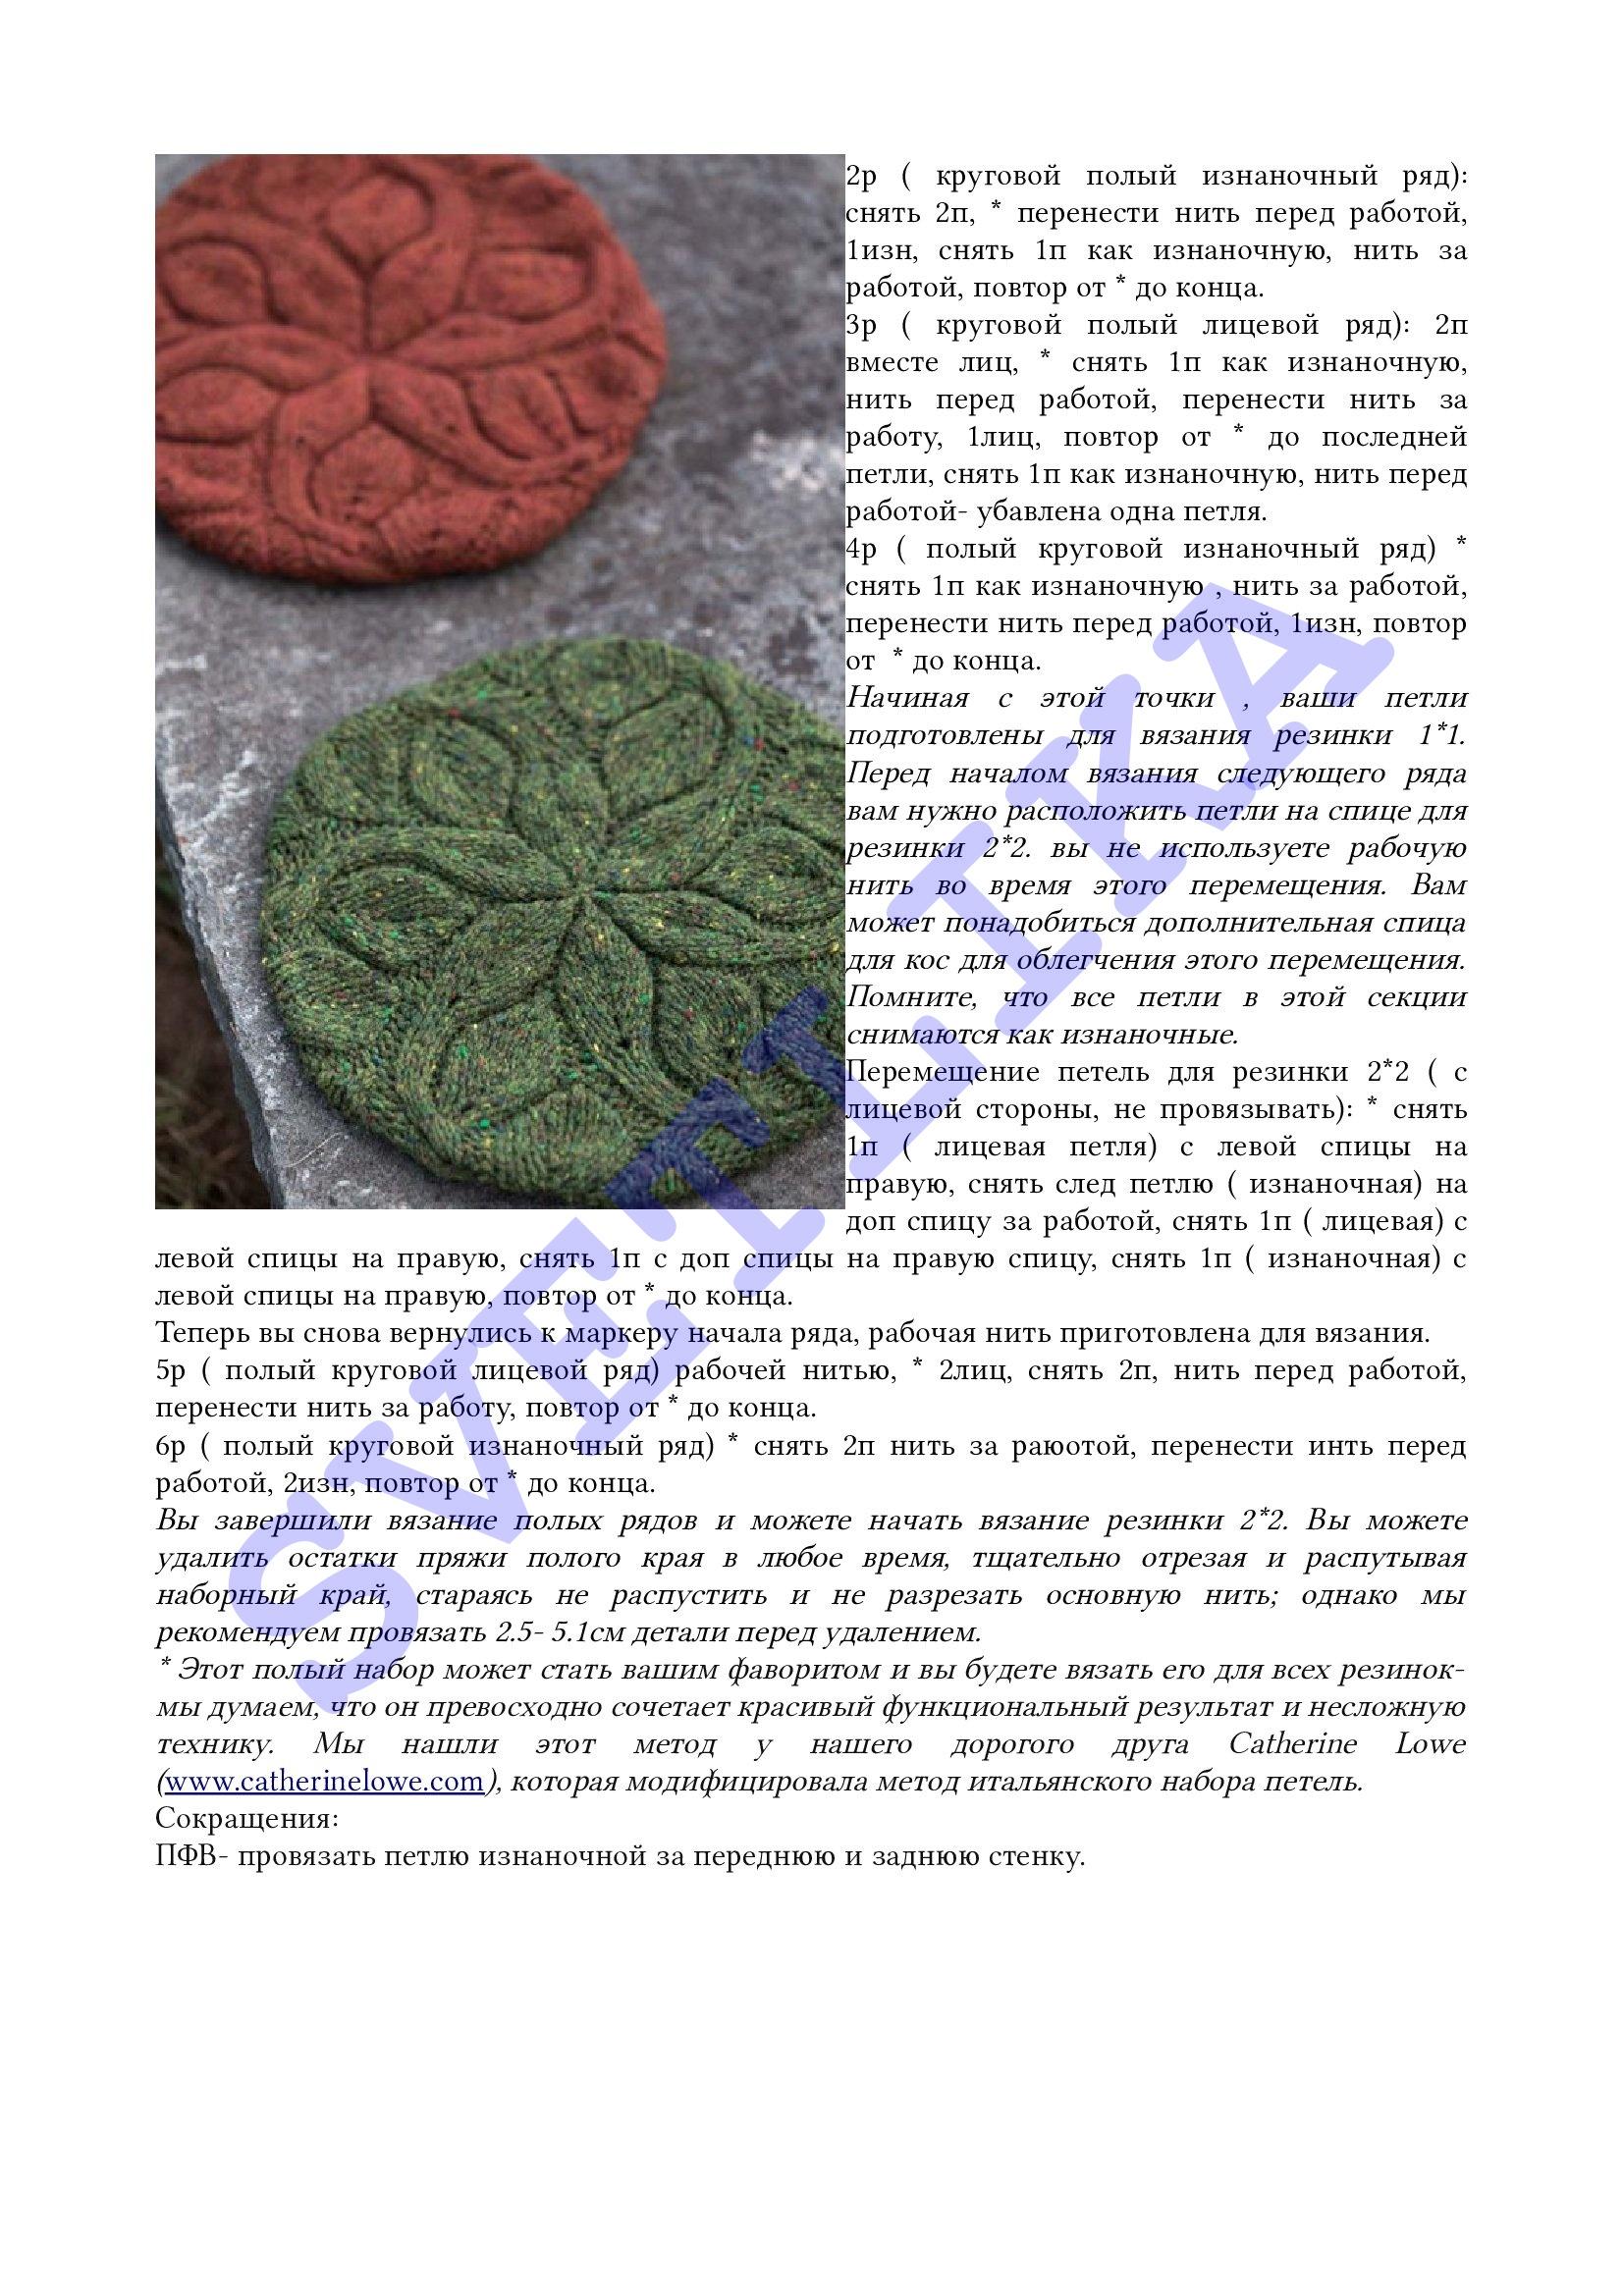 https://img-fotki.yandex.ru/get/4702/125862467.59/0_153cc2_c19cd01f_orig